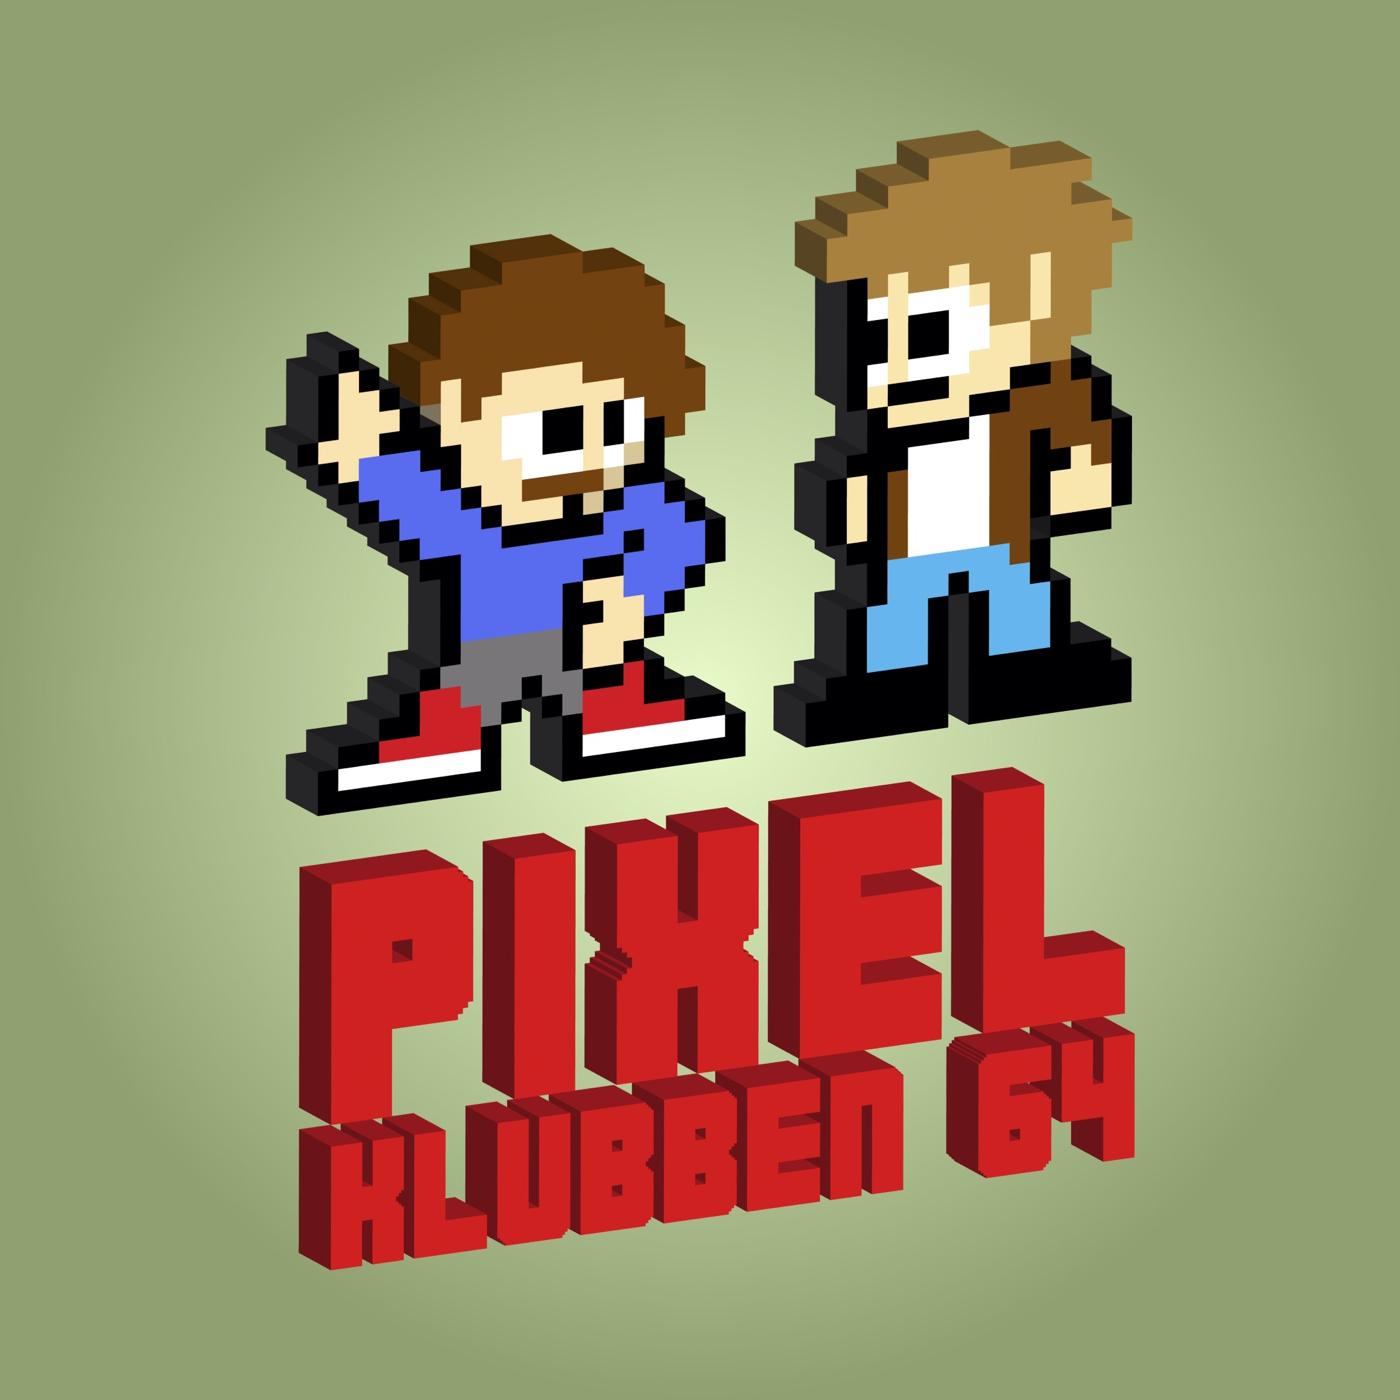 Pixelklubben 64